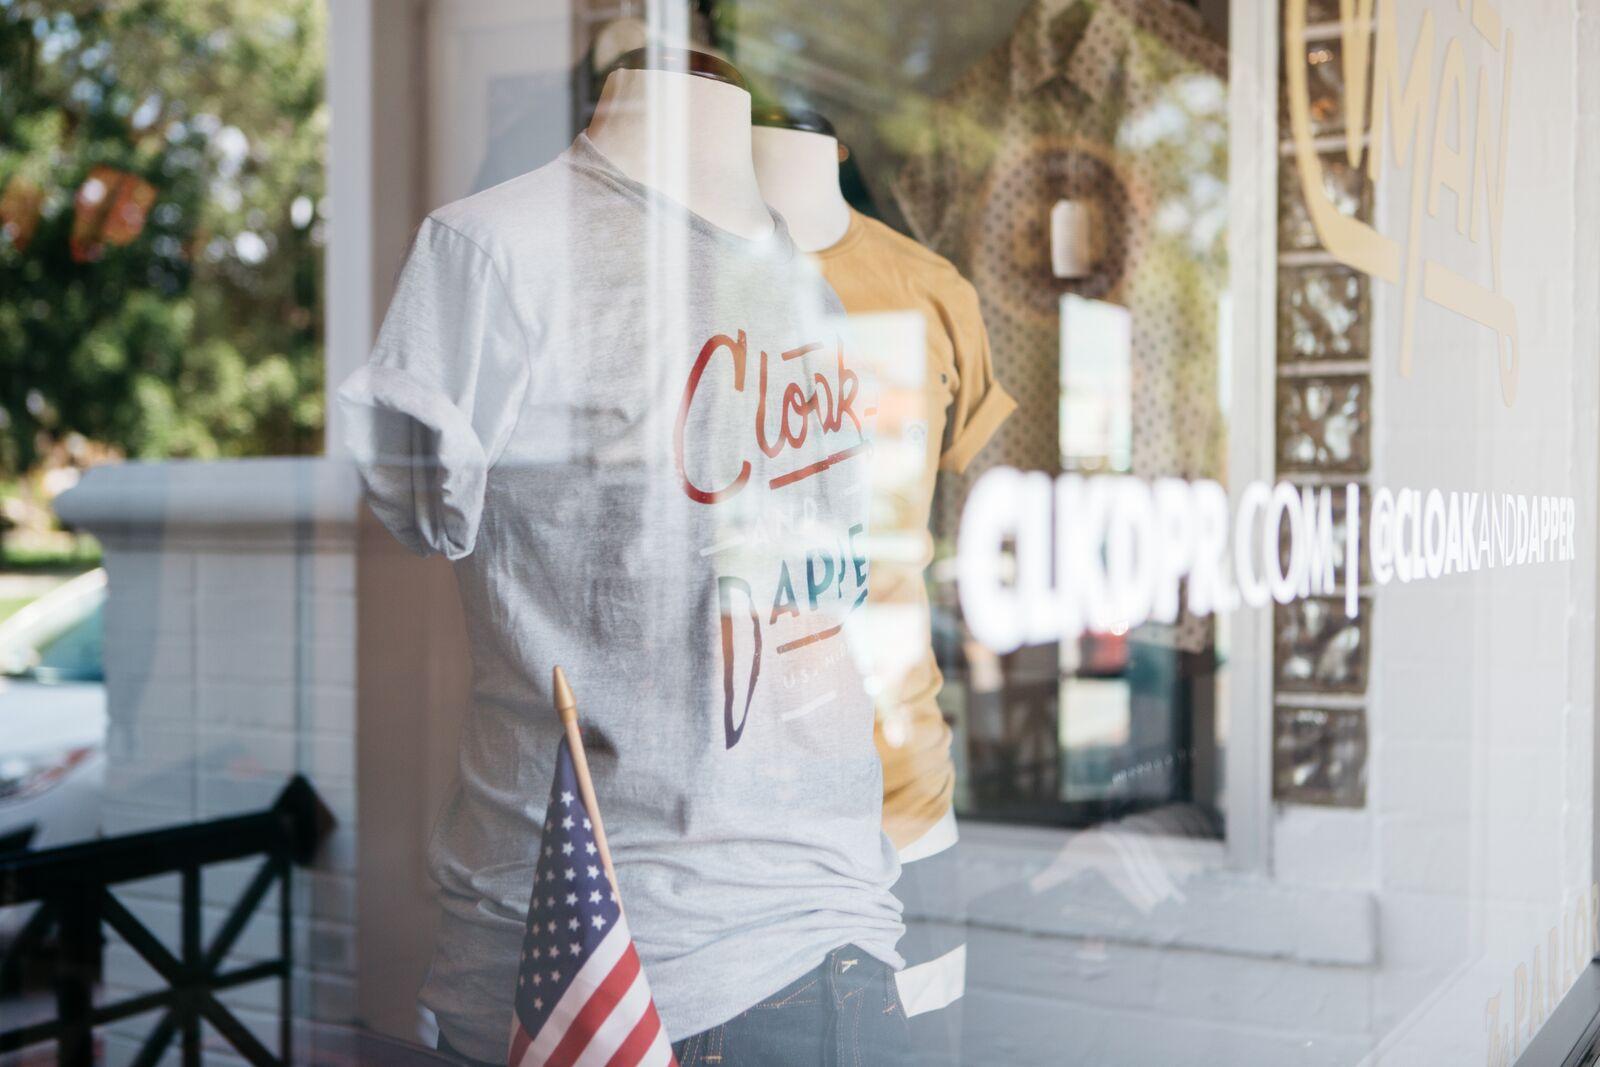 Cloak & Dapper storefront display